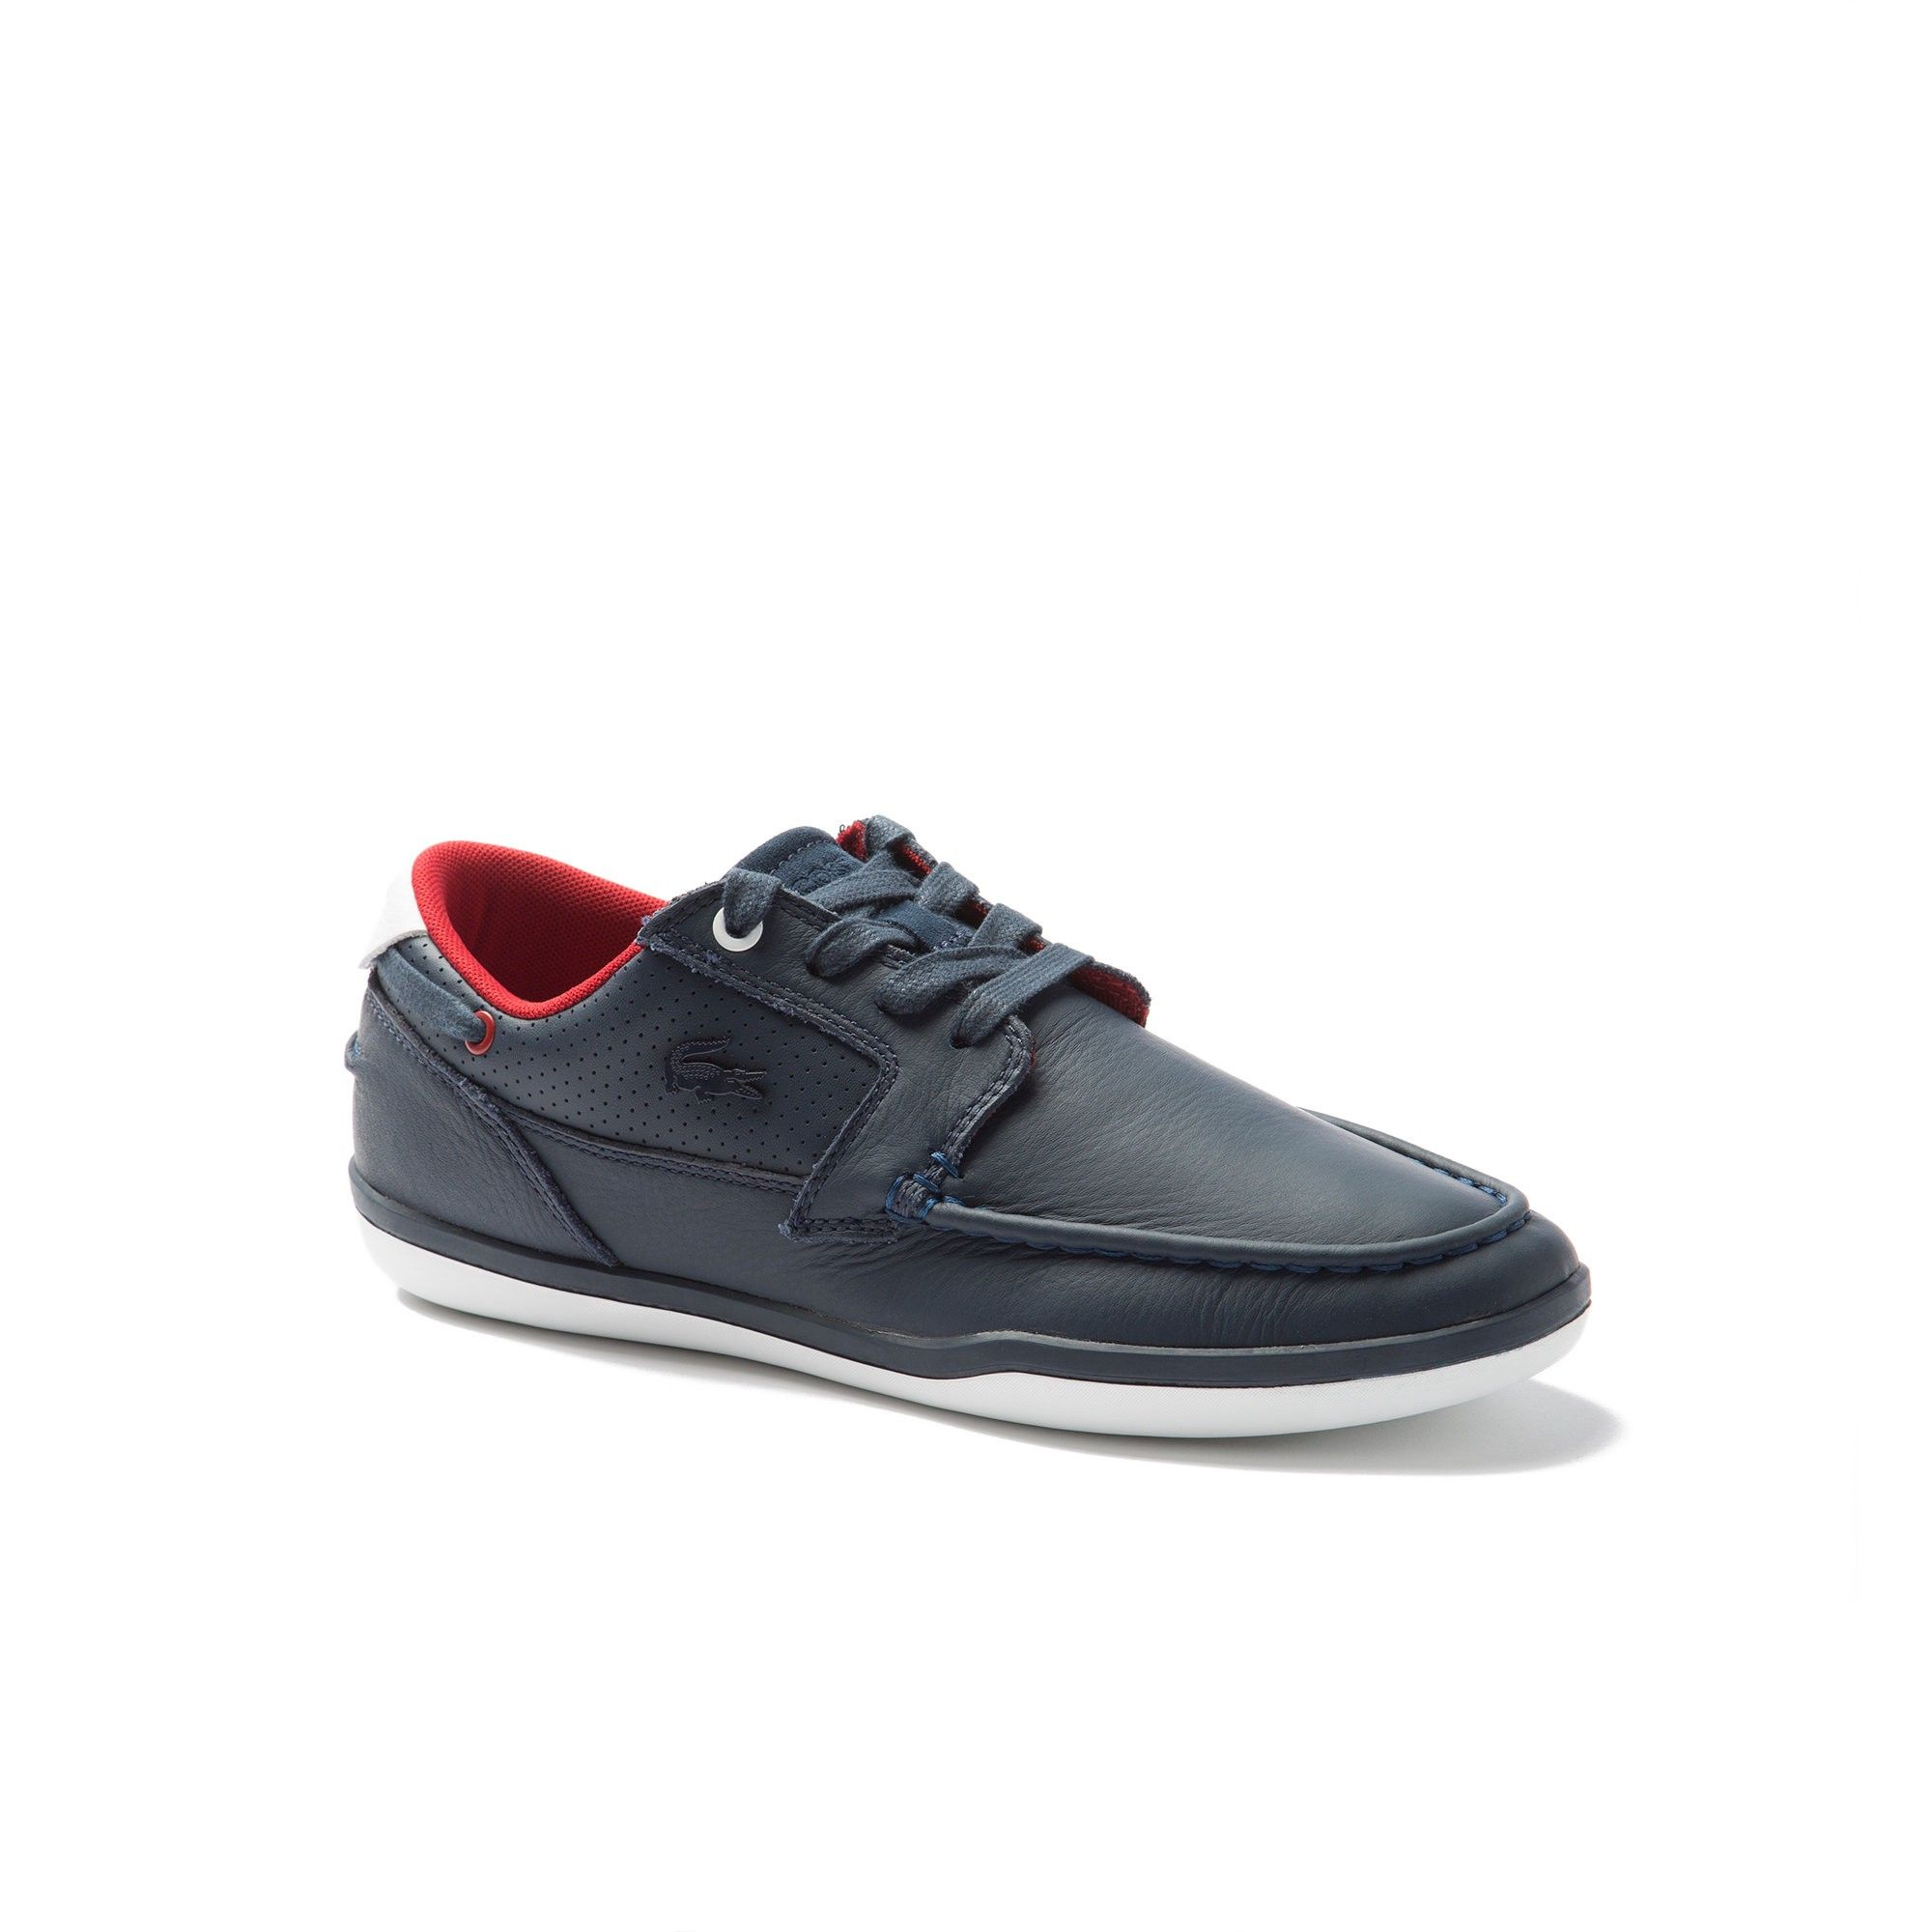 e1963e33fa46 LACOSTE Men s Deck-Minimal Leather Sneakers - navy white.  lacoste  shoes